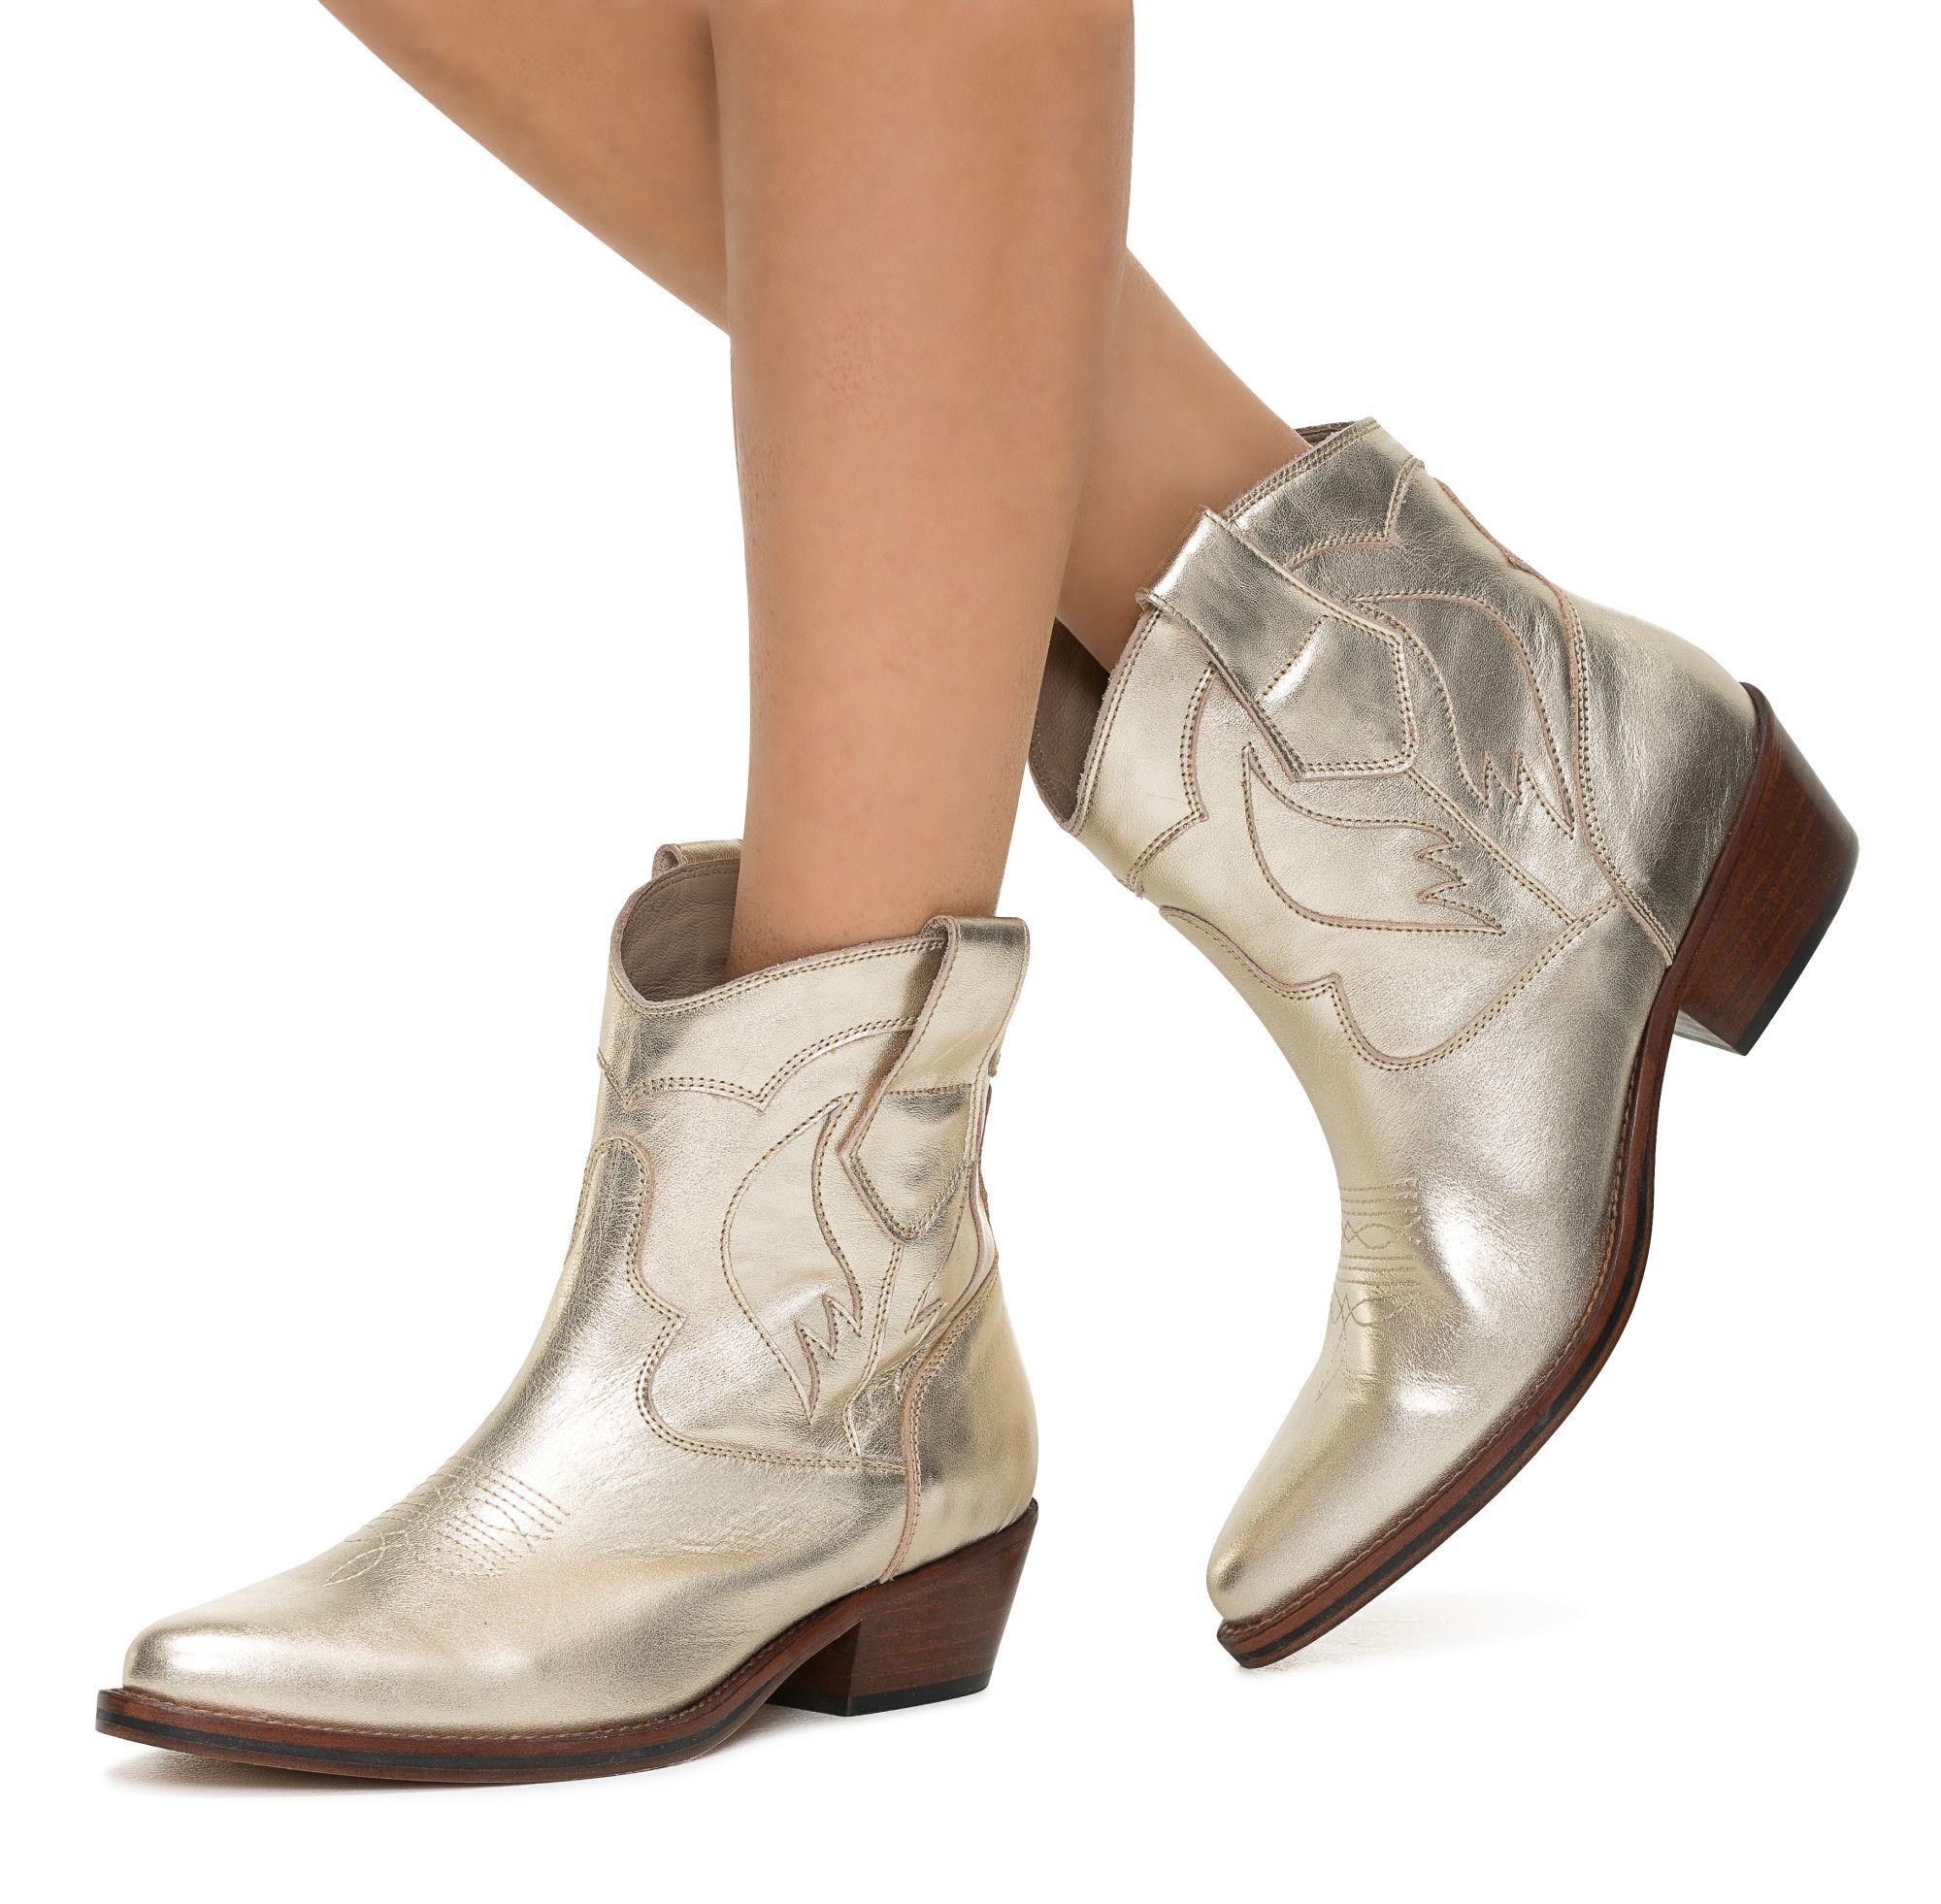 Toral 11120 Enkellaarsjes Goud online bestellen shoe